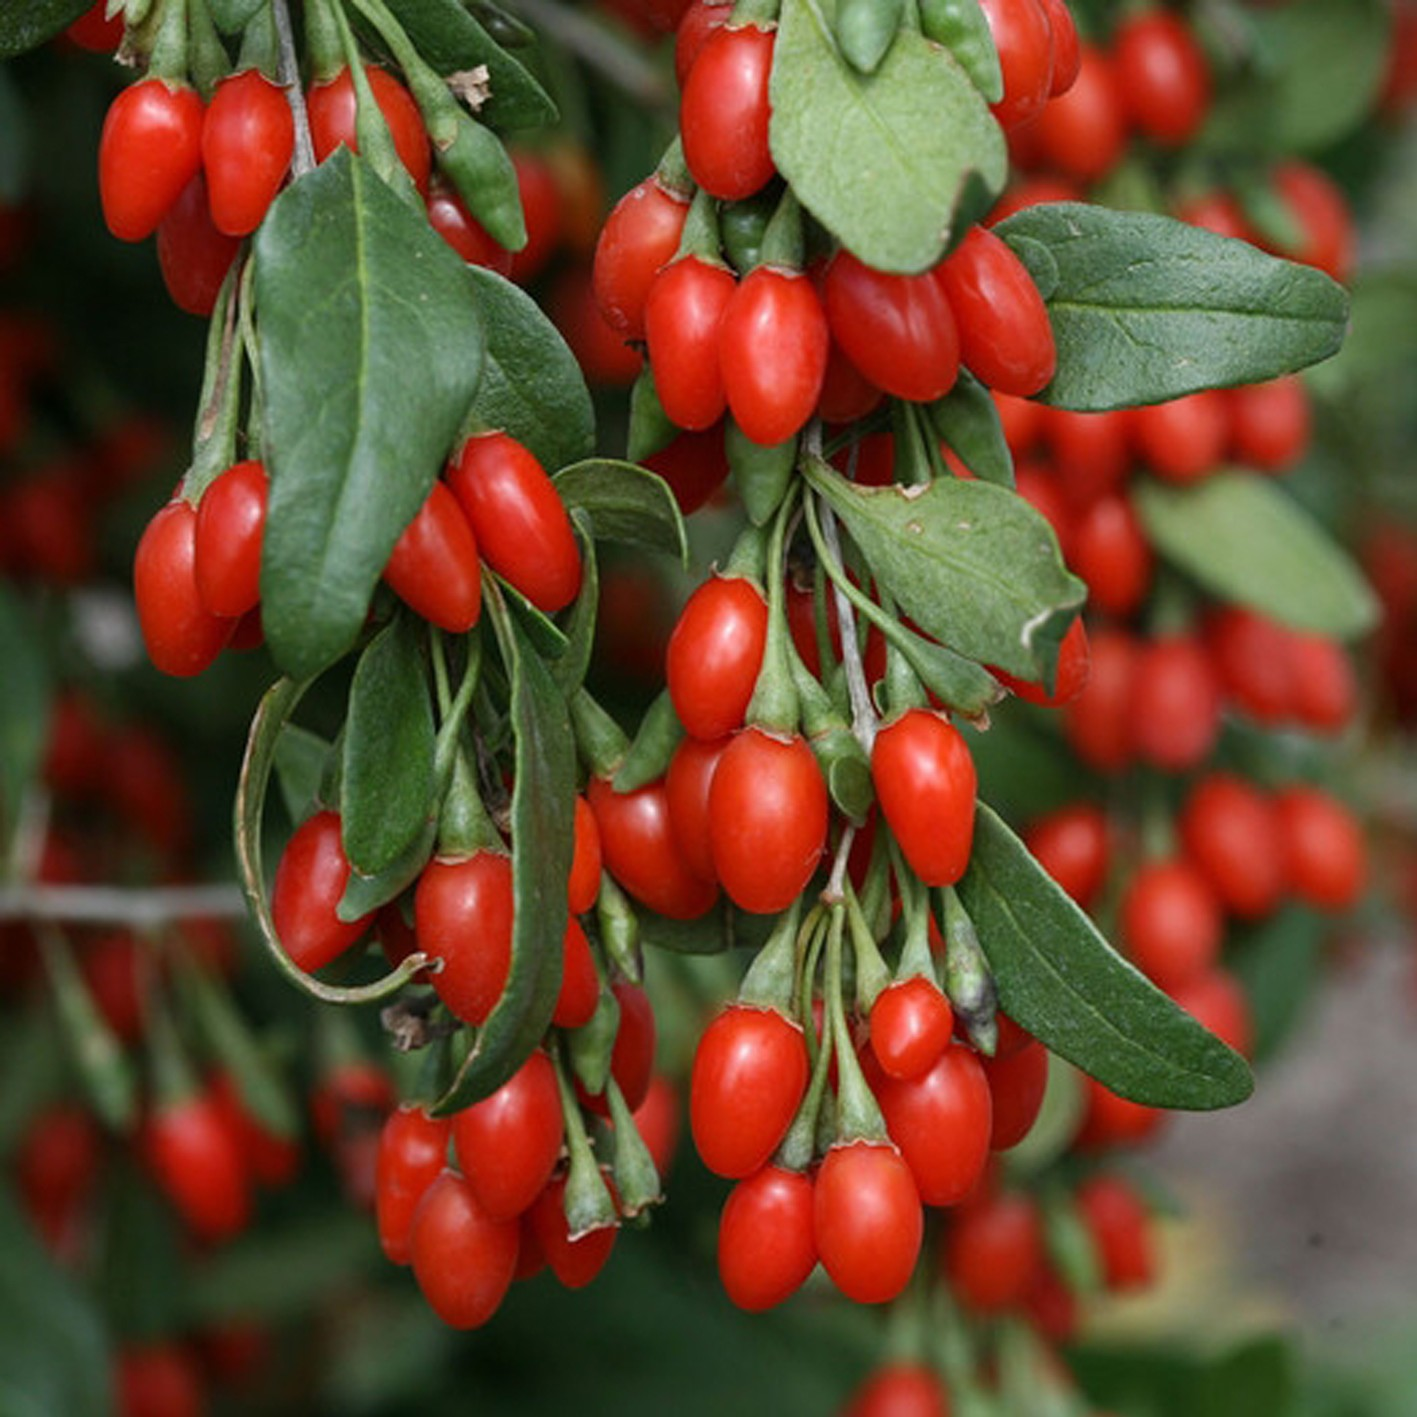 plante baie de goji